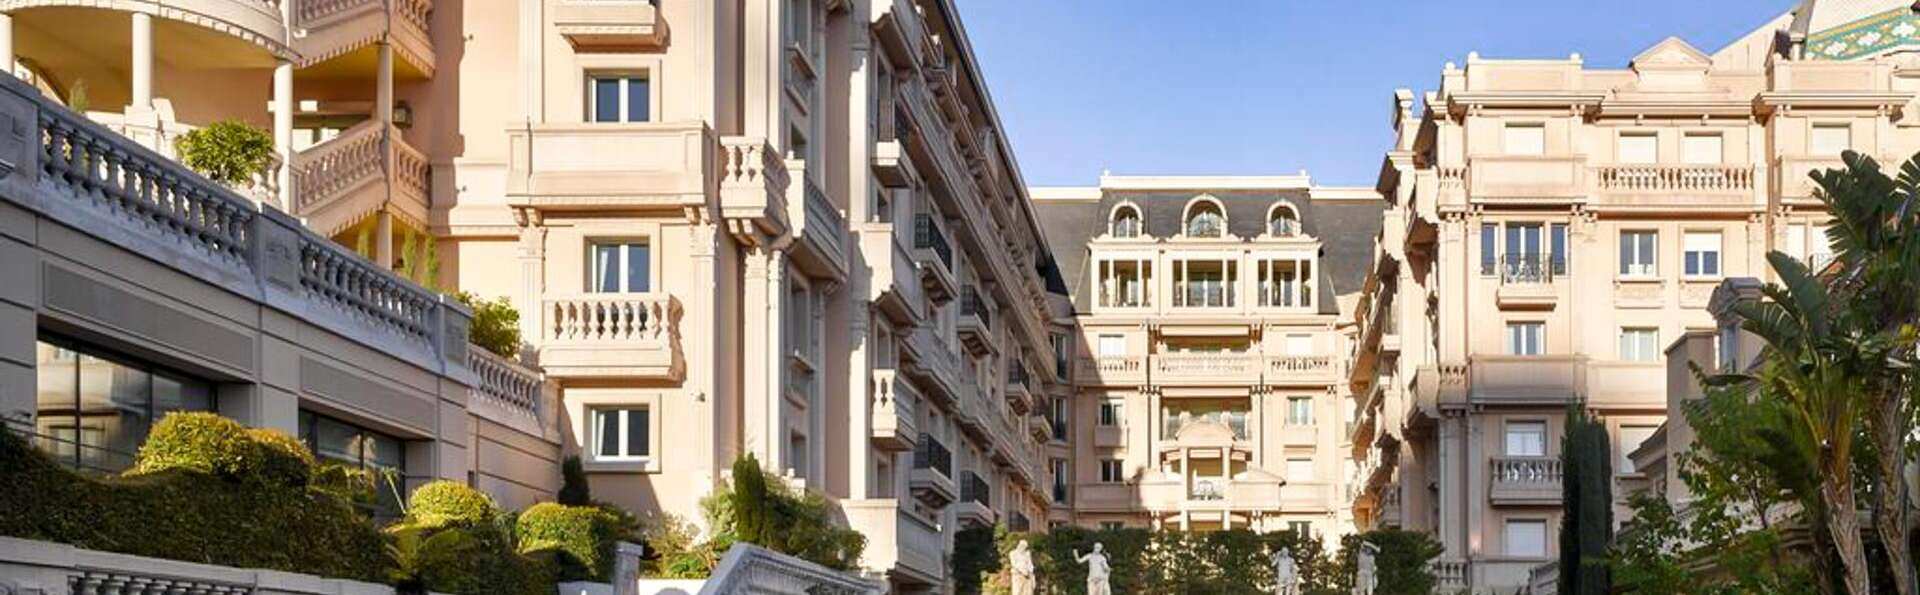 Hotel Metropole Monte Carlo - EDIT_WEB_FRONT_02.jpg